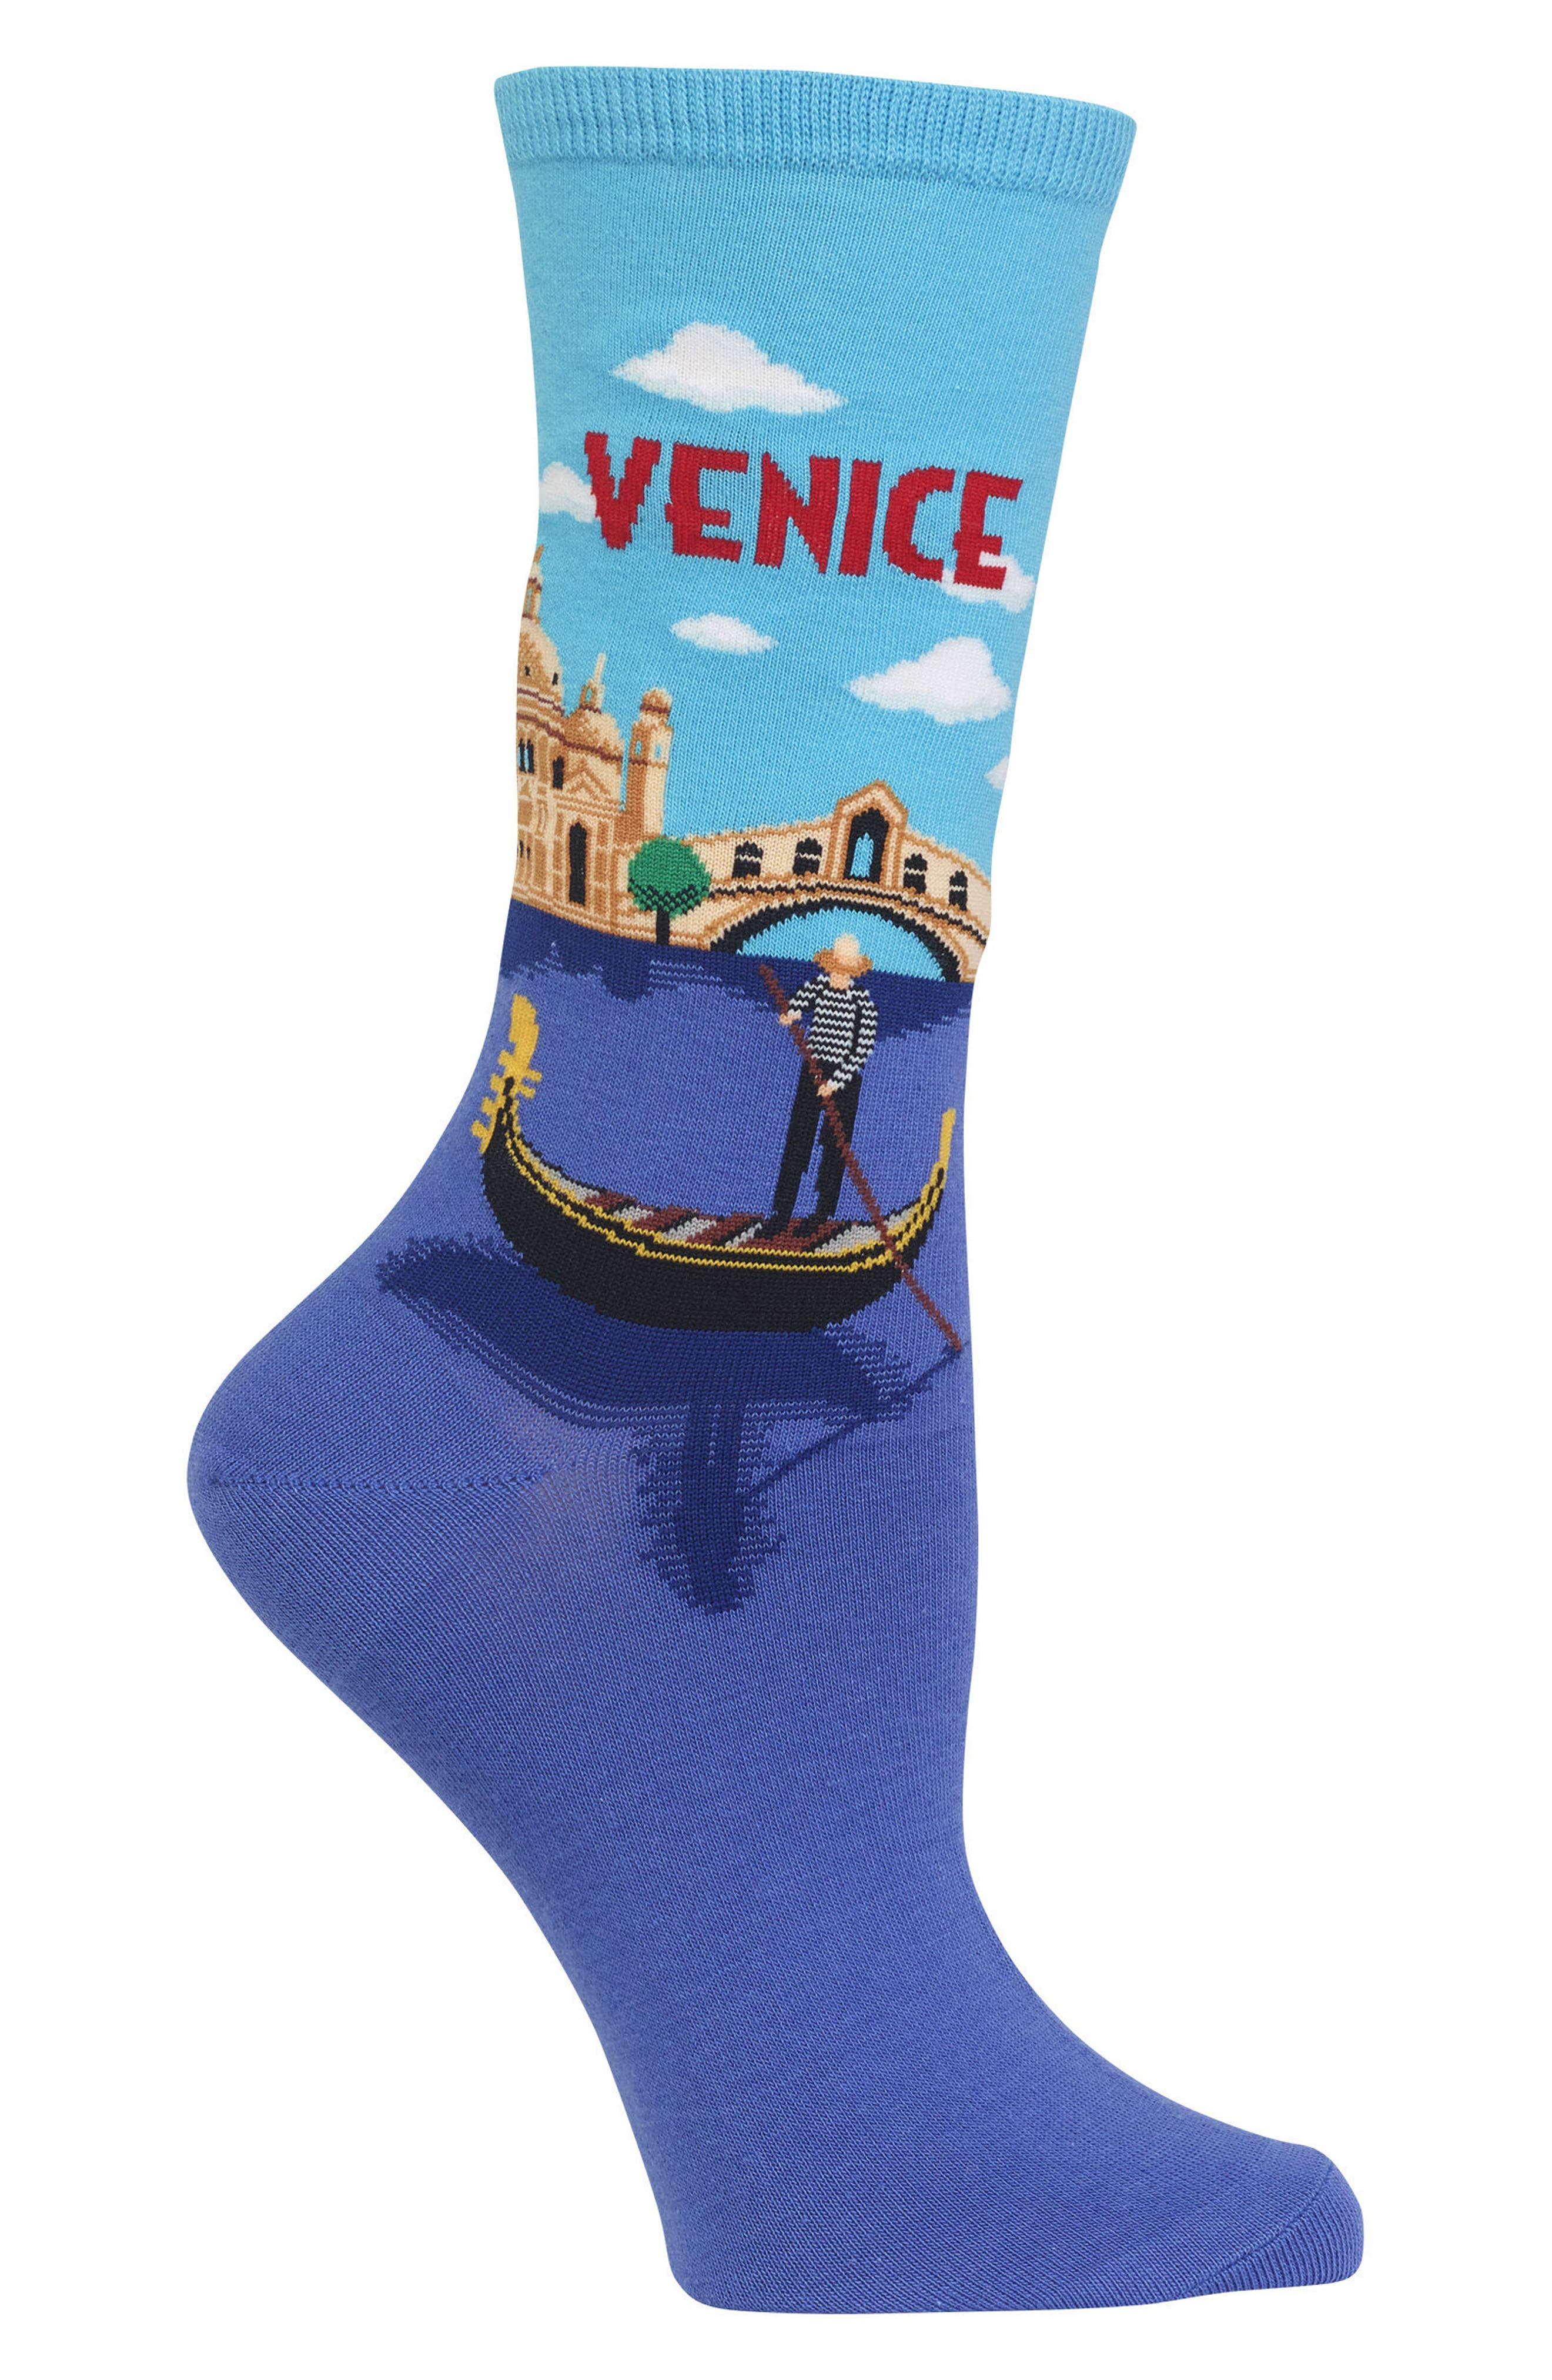 Travel Series - Venice Crew Socks,                             Alternate thumbnail 3, color,                             Light Blue